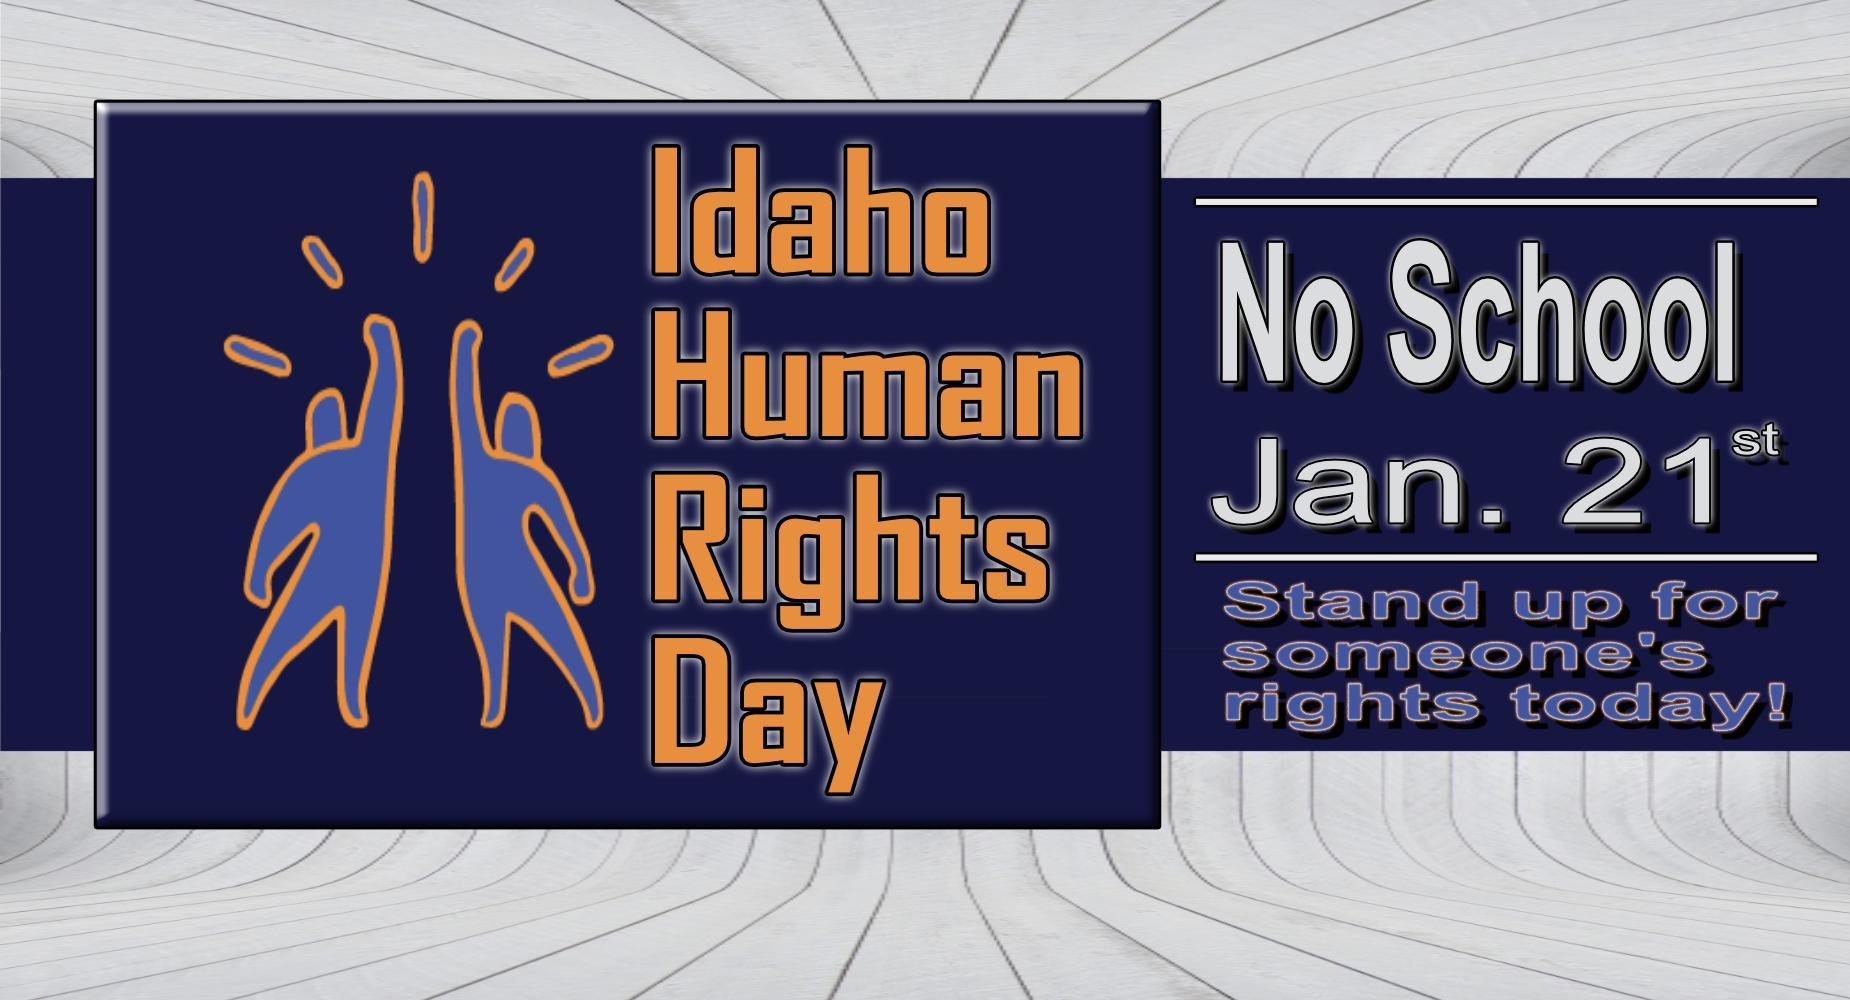 Idaho Human Rights Day 2019